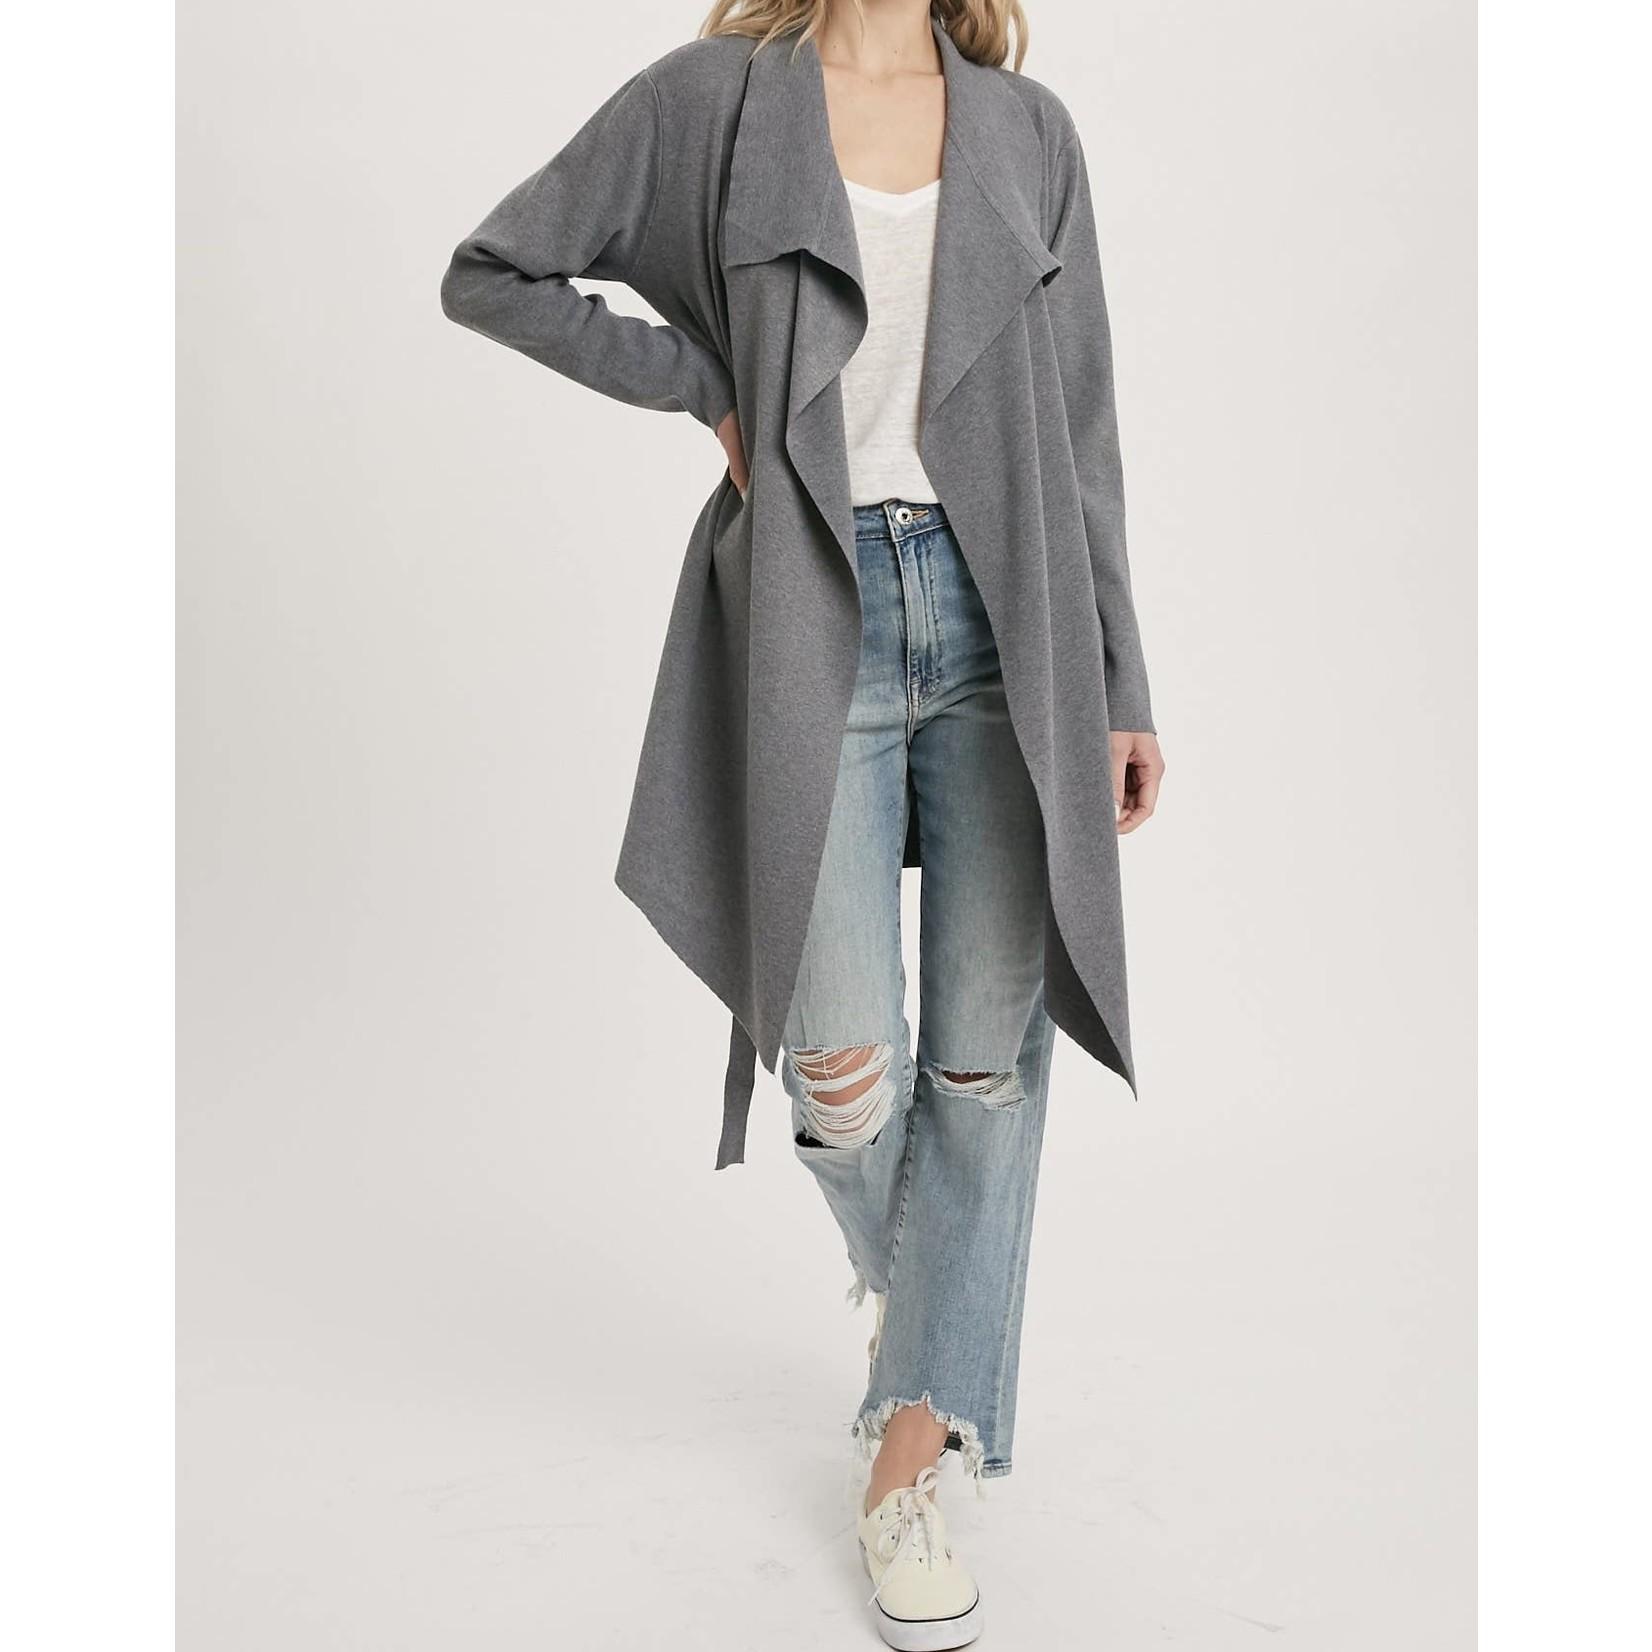 Blueivy Jacket: Dark Grey Drape Front Trench